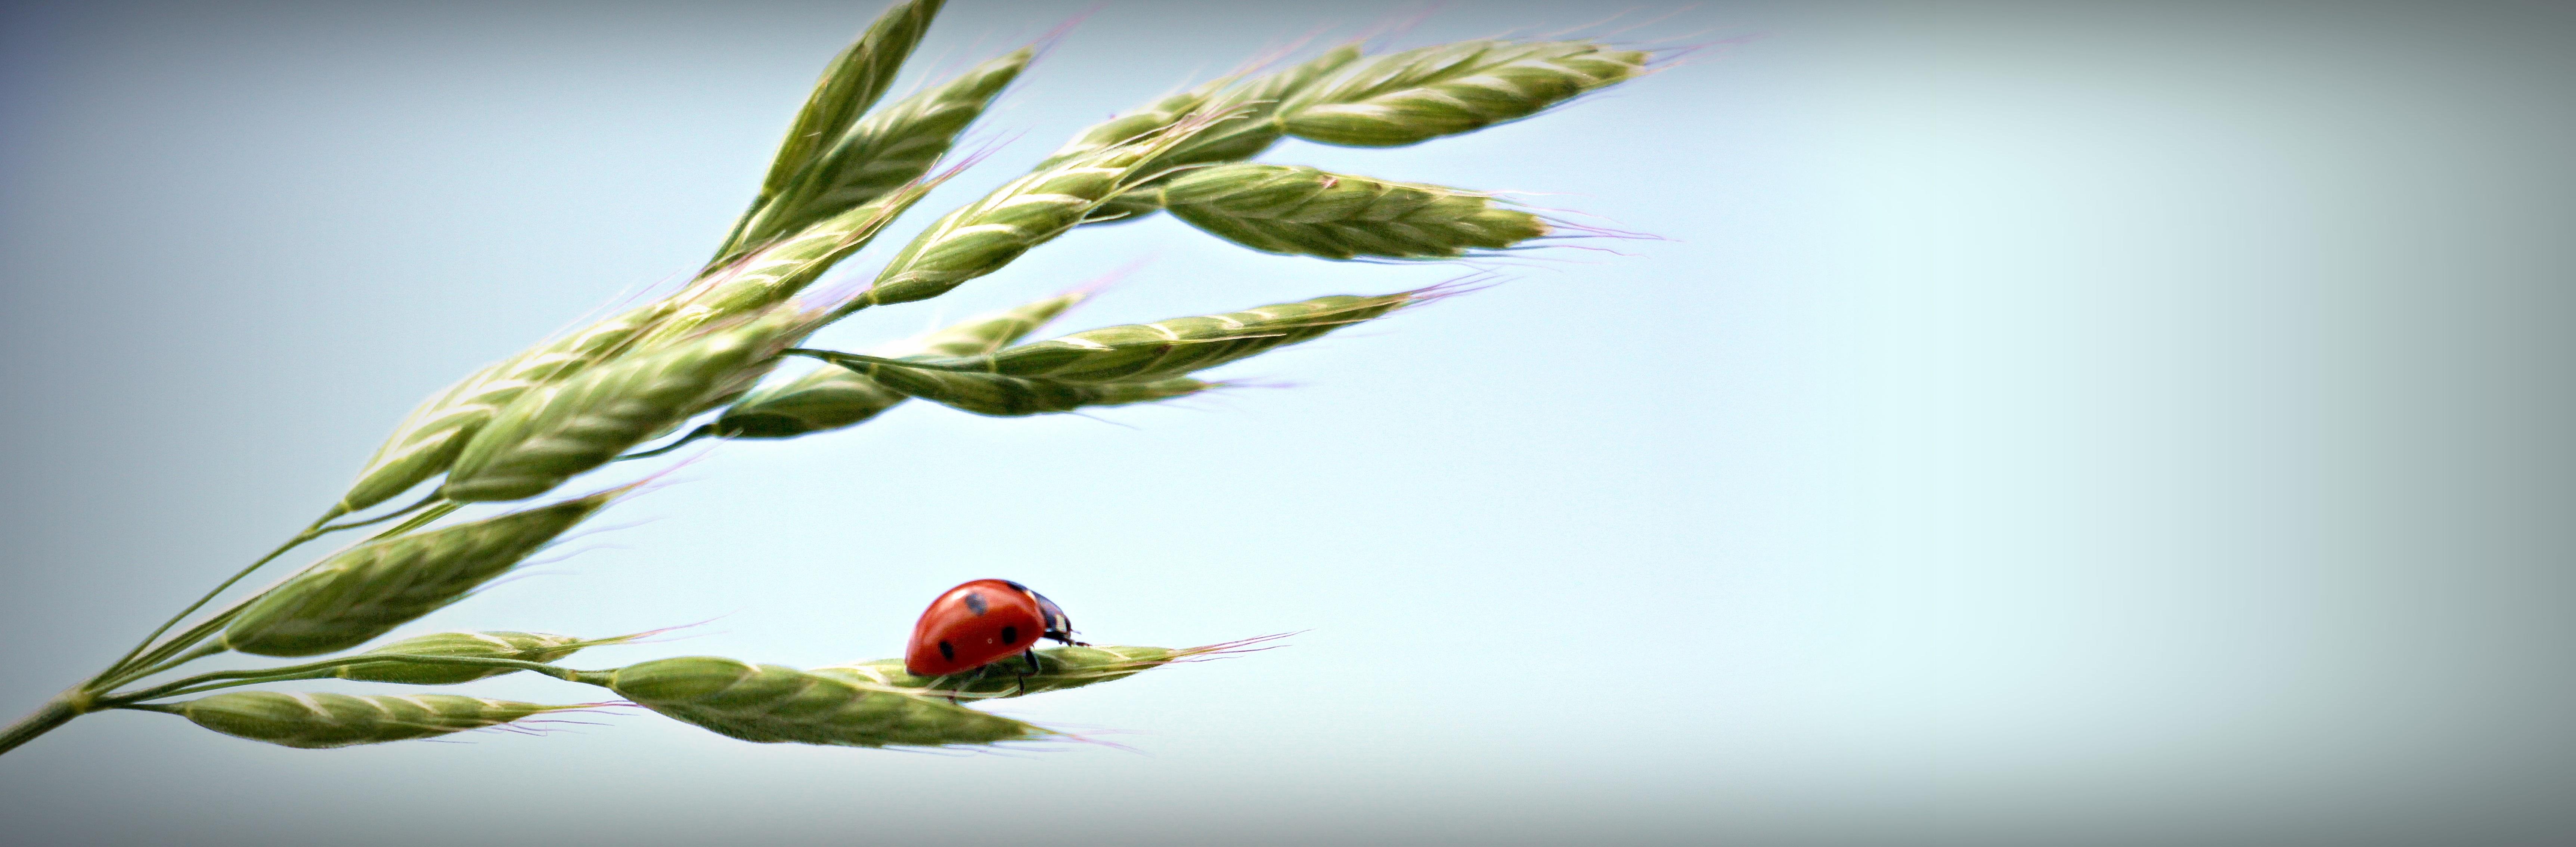 Ladybud on the wheat photo